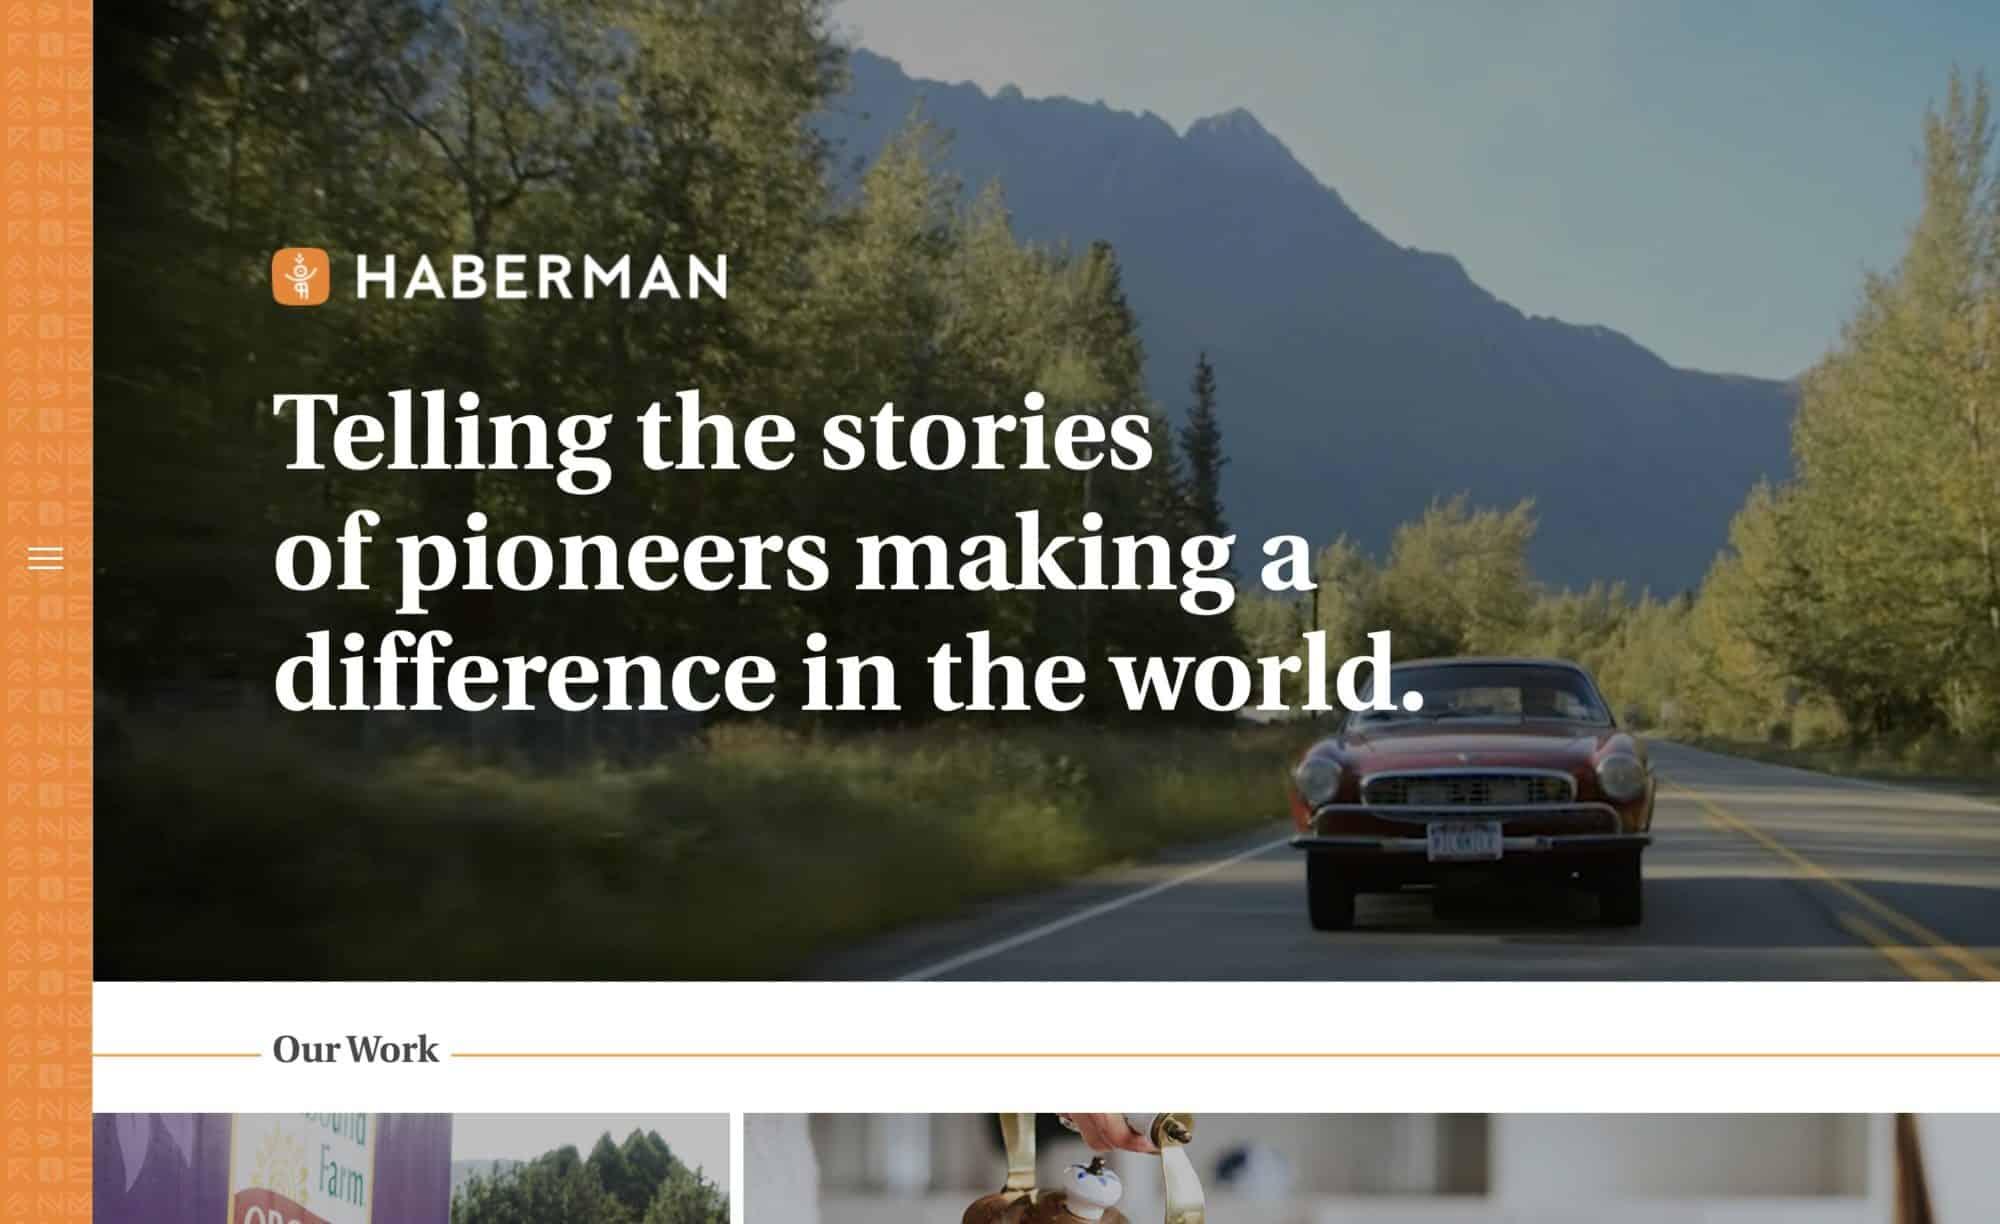 Haberman - Modern Storytellers